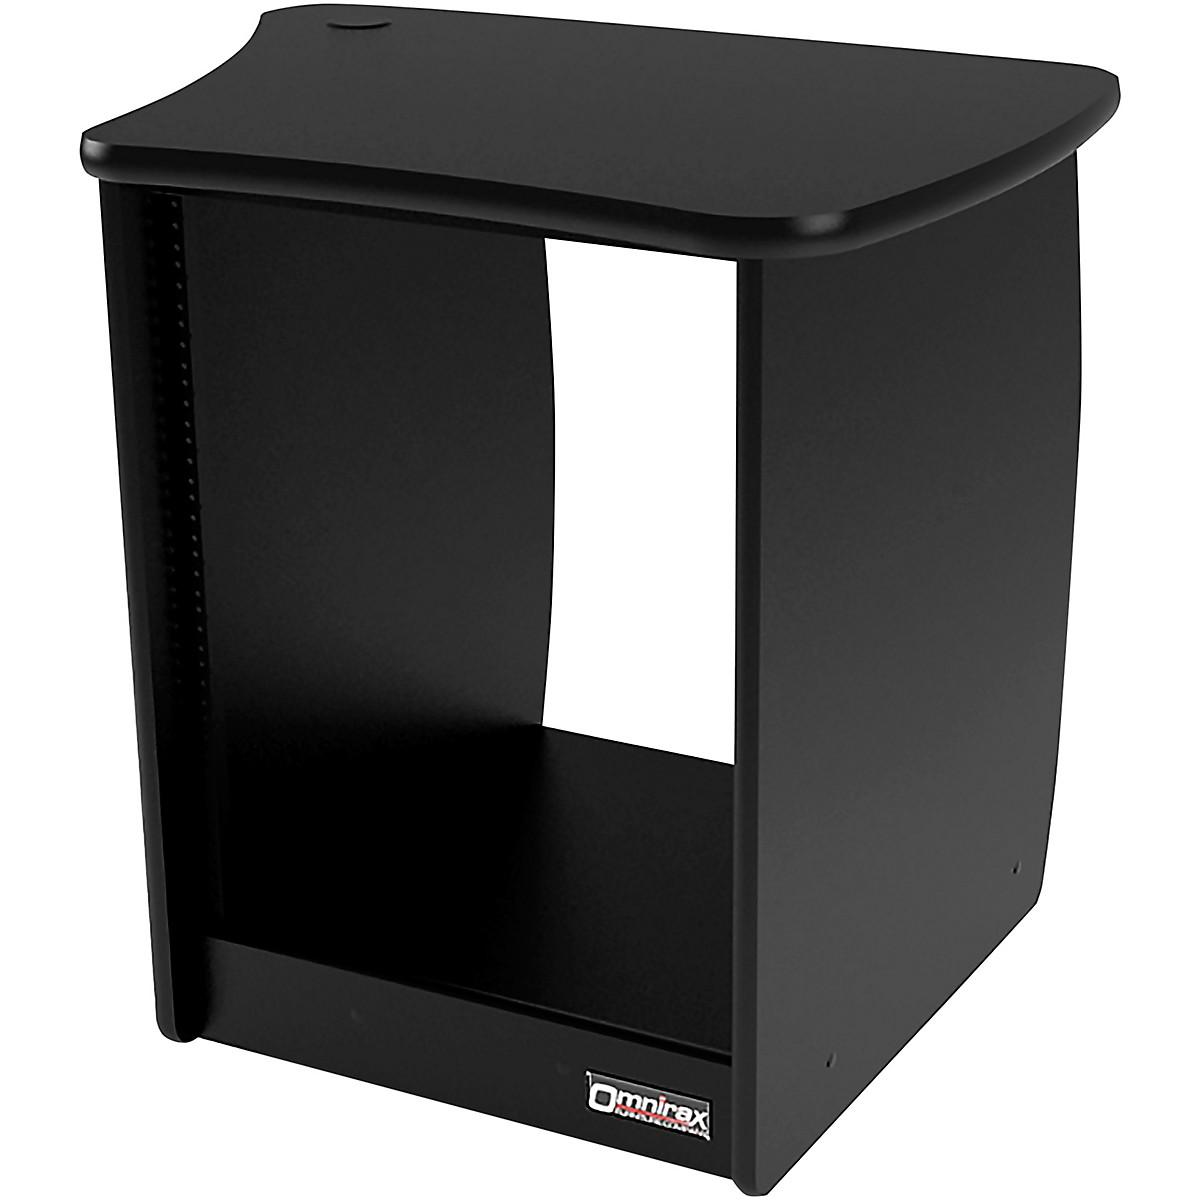 Omnirax OM13R 13-Rackspace Cabinet for the Right Side of the OmniDesk - Black